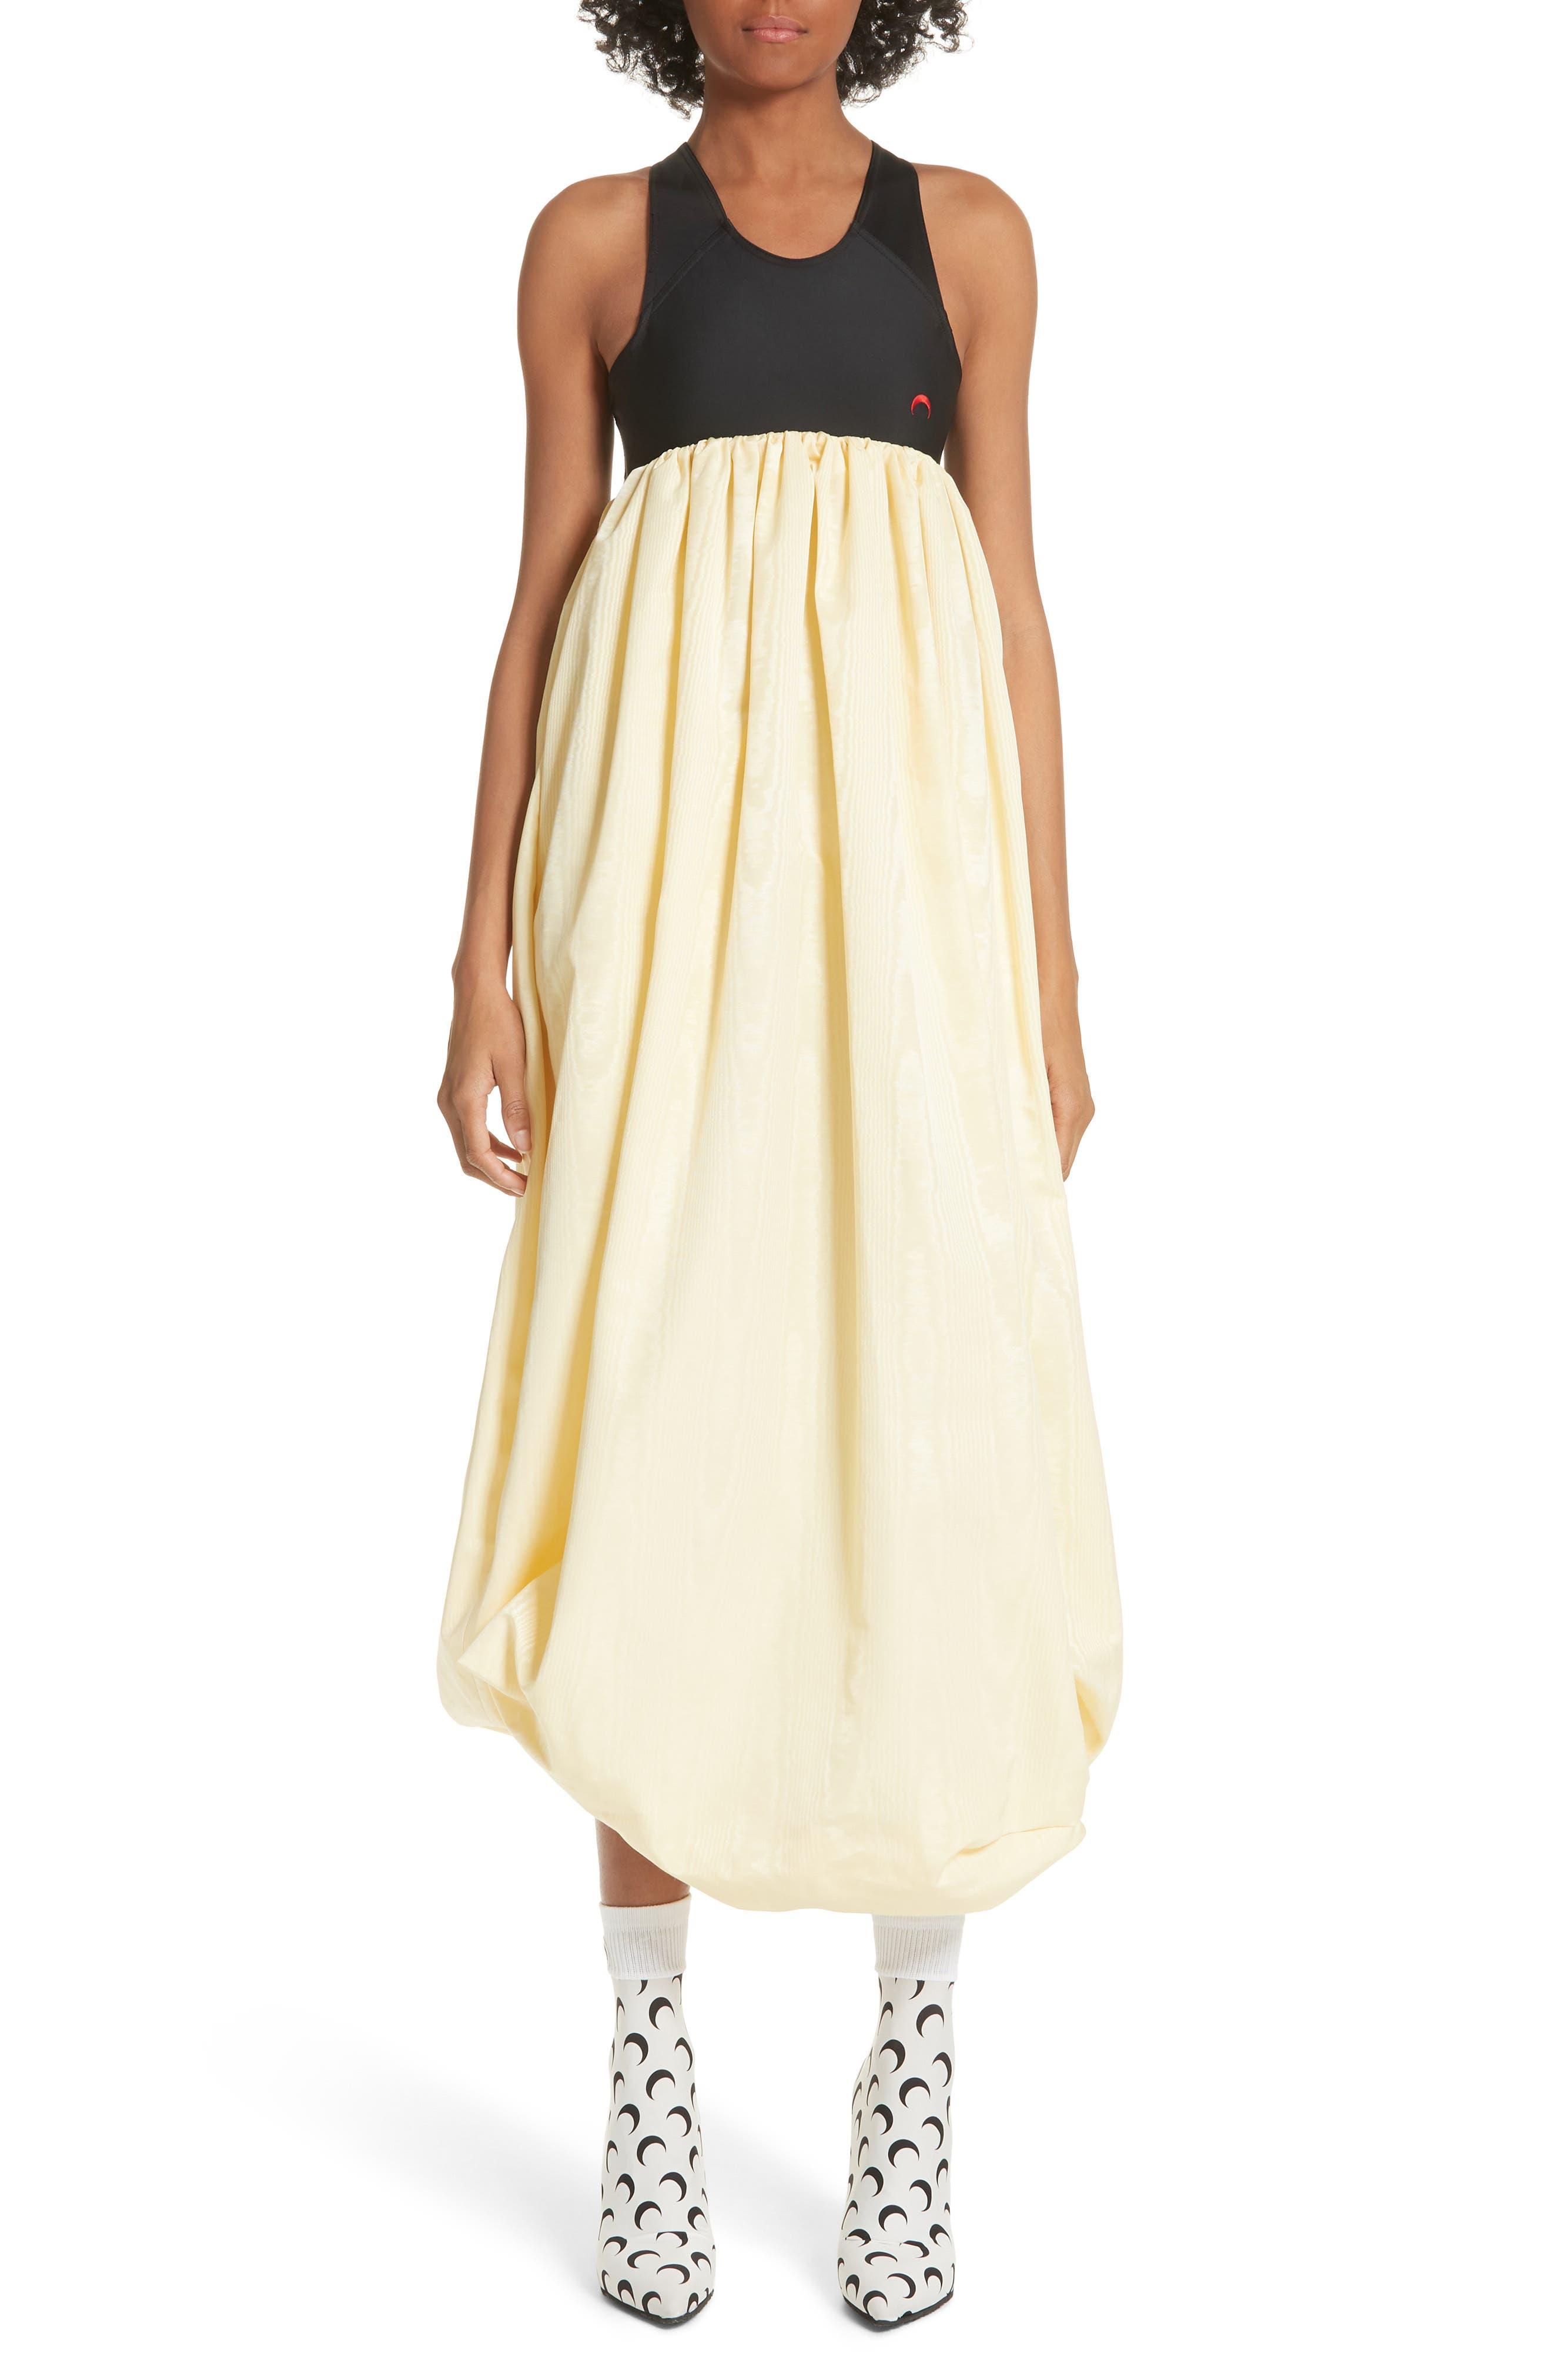 Hybrid Ball Dress,                         Main,                         color, Black/ Yellow